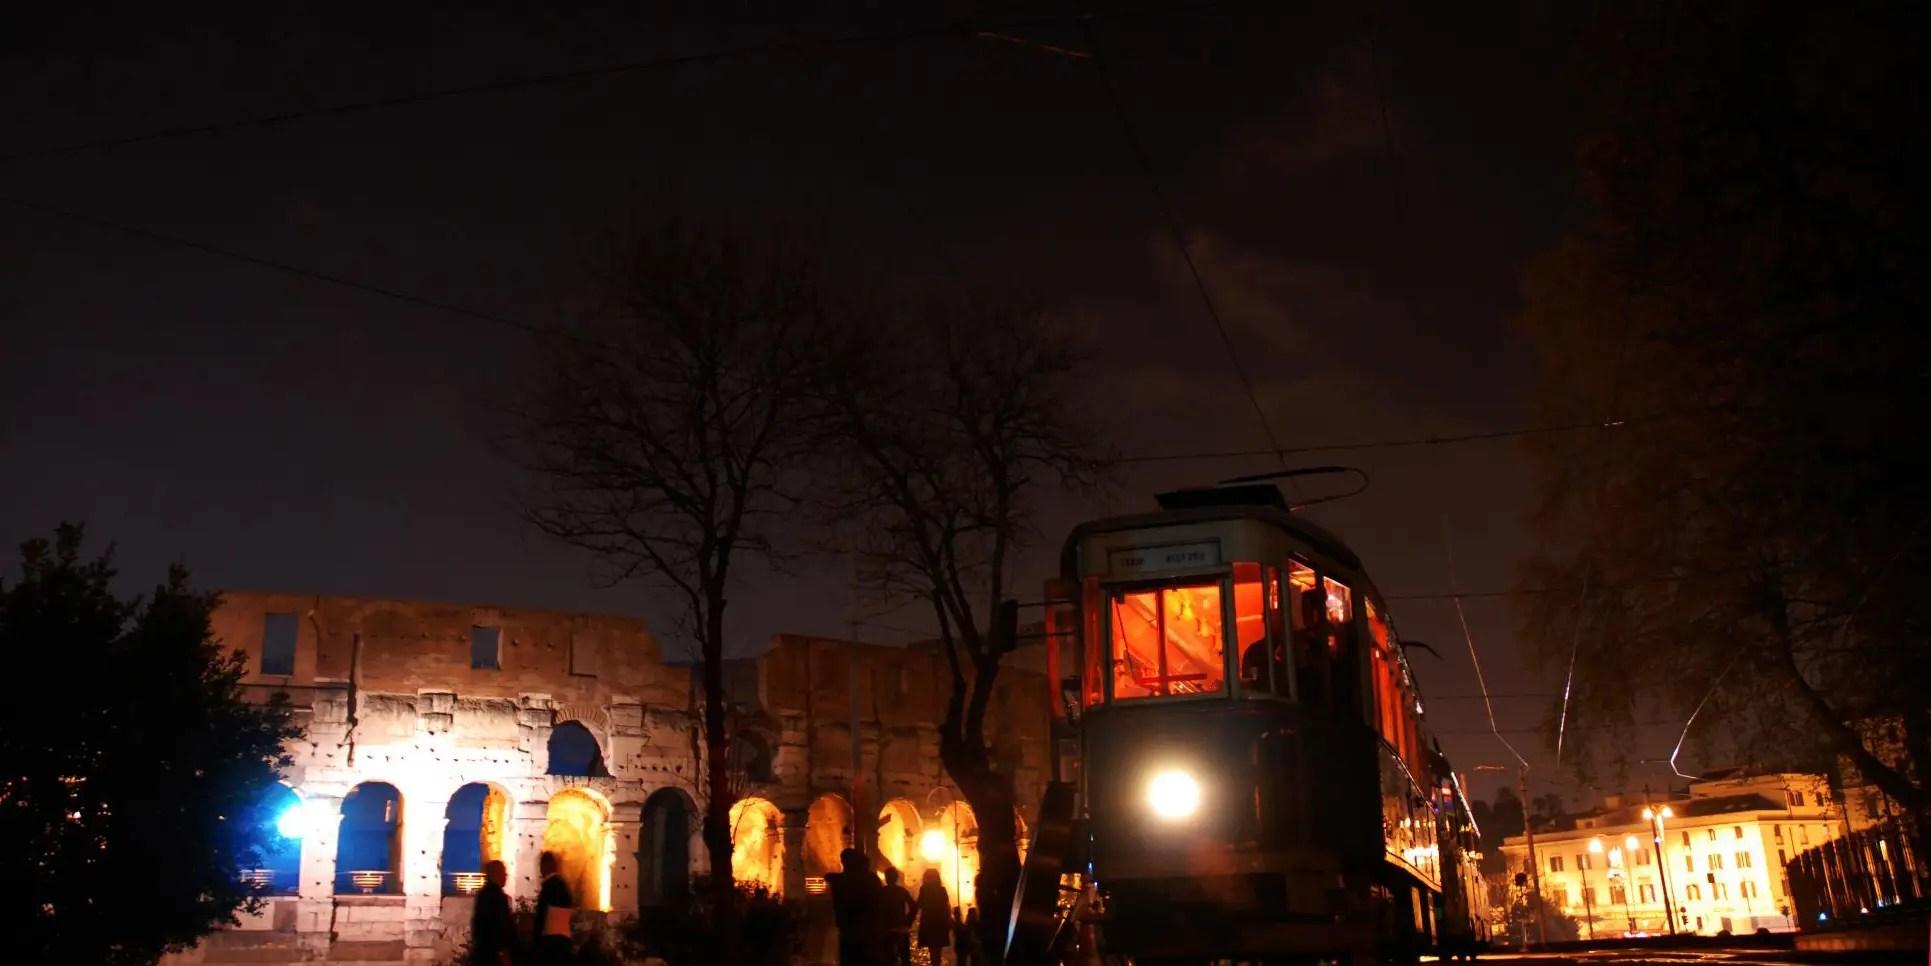 Tramjazz, Rome